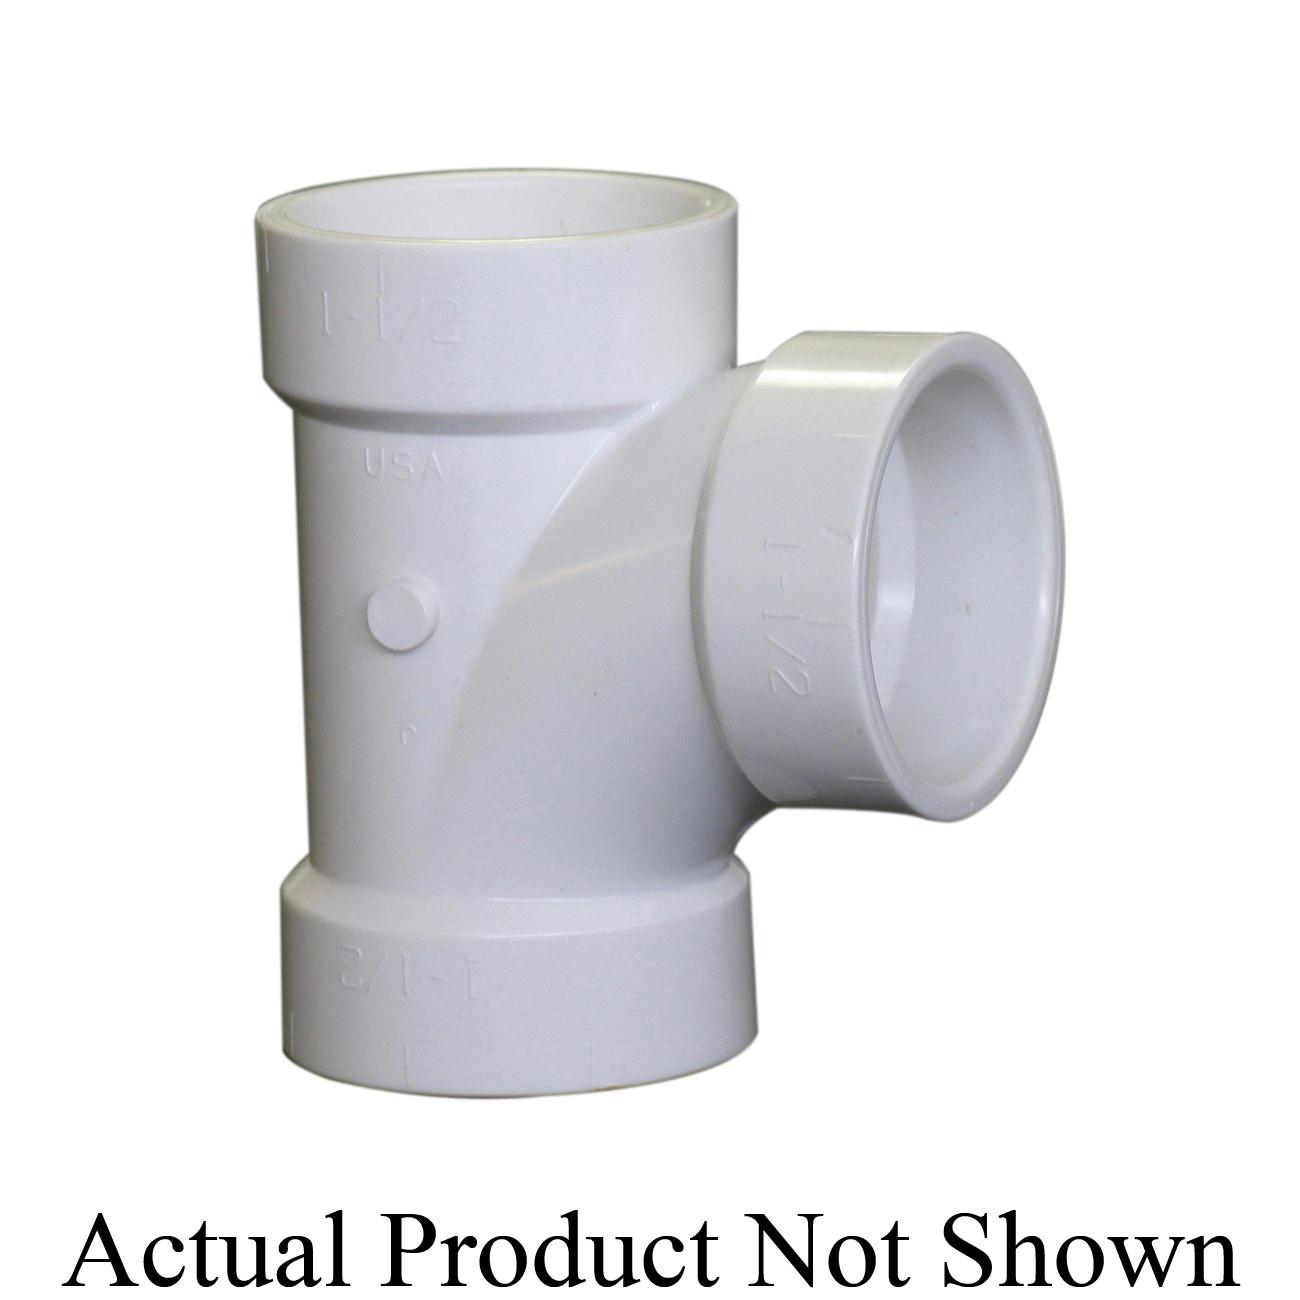 NIBCO® K099250 4811 DWV Reducing Sanitary Tee, 4 x 4 x 3 in Nominal, Hub End Style, SCH 40/STD, PVC, Domestic